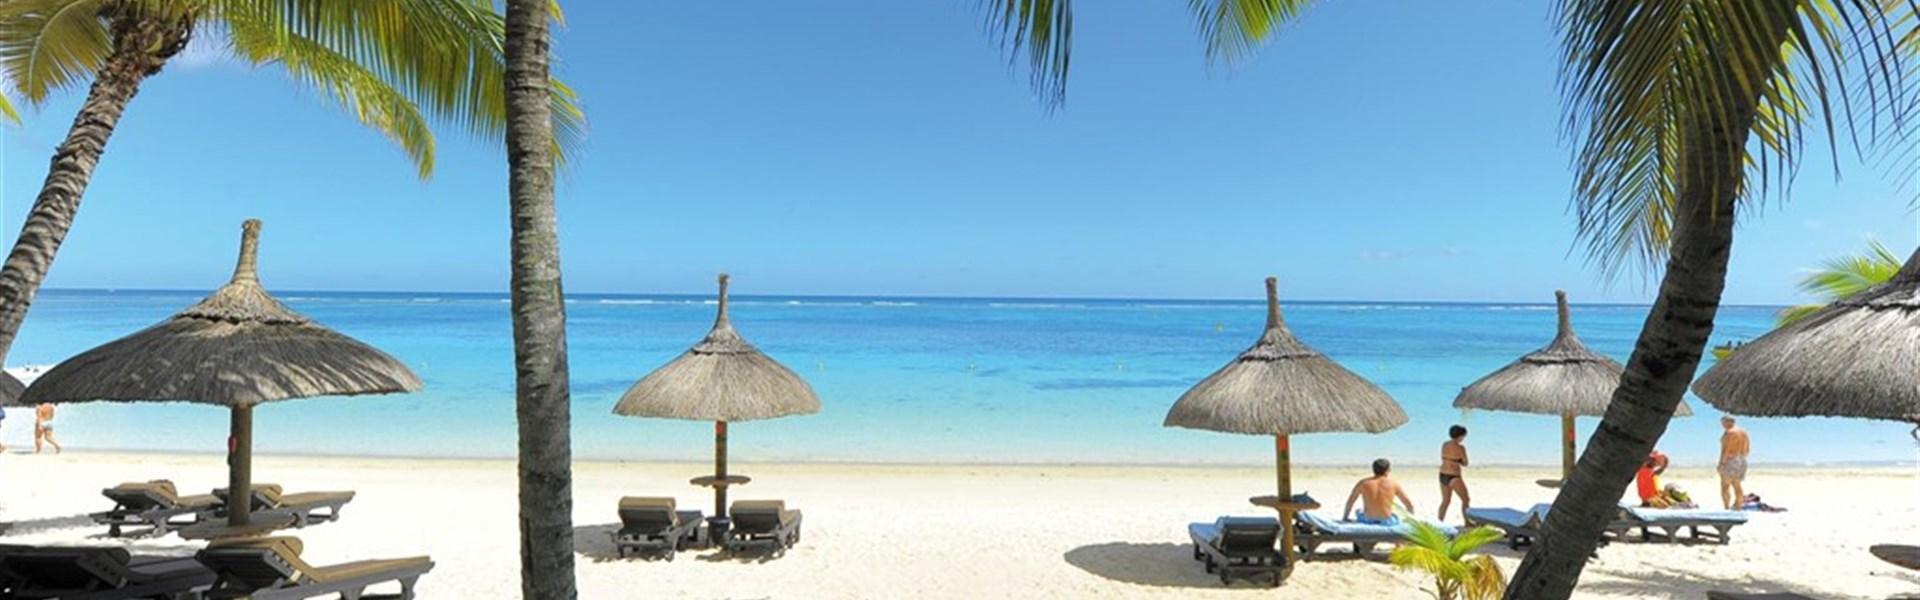 Marco Polo - Trou Aux Biches Beachcomber Golf Resort & Spa -